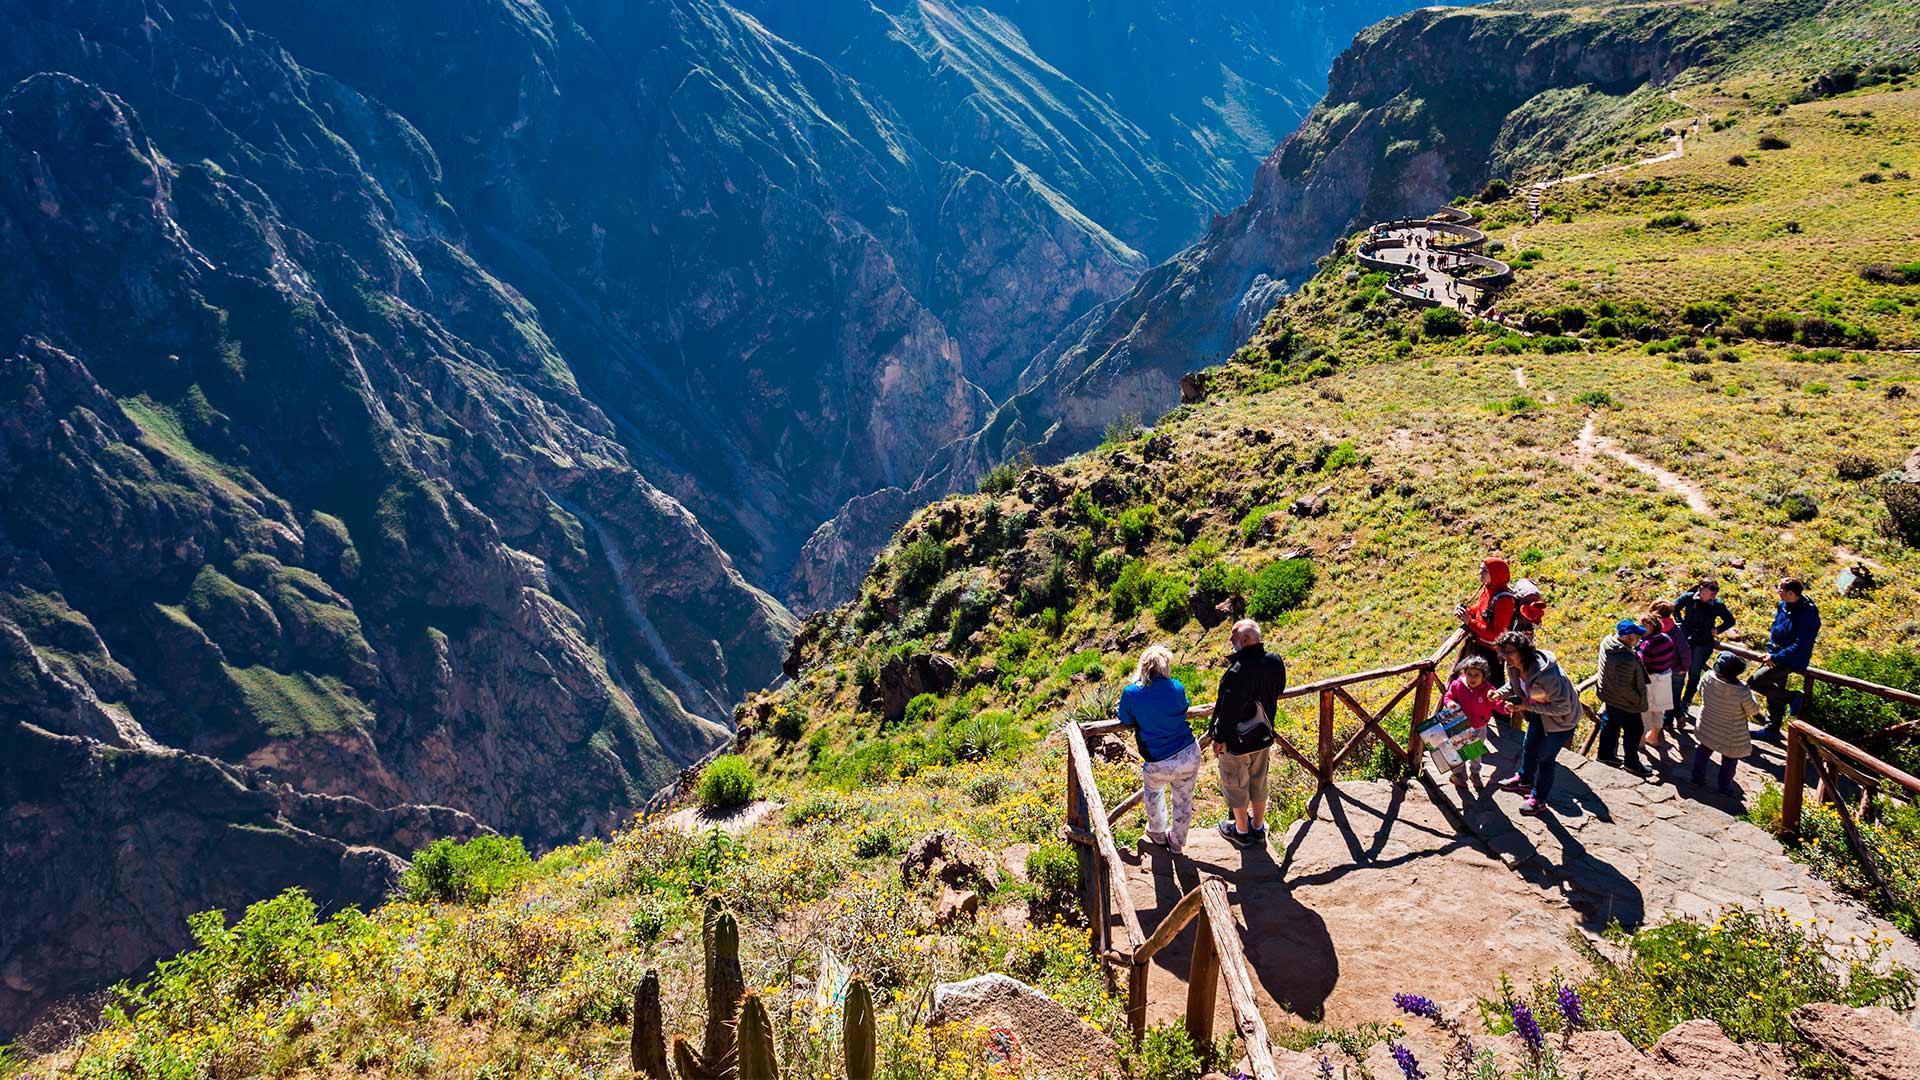 The Colca Canyon: Kingdom of the condor